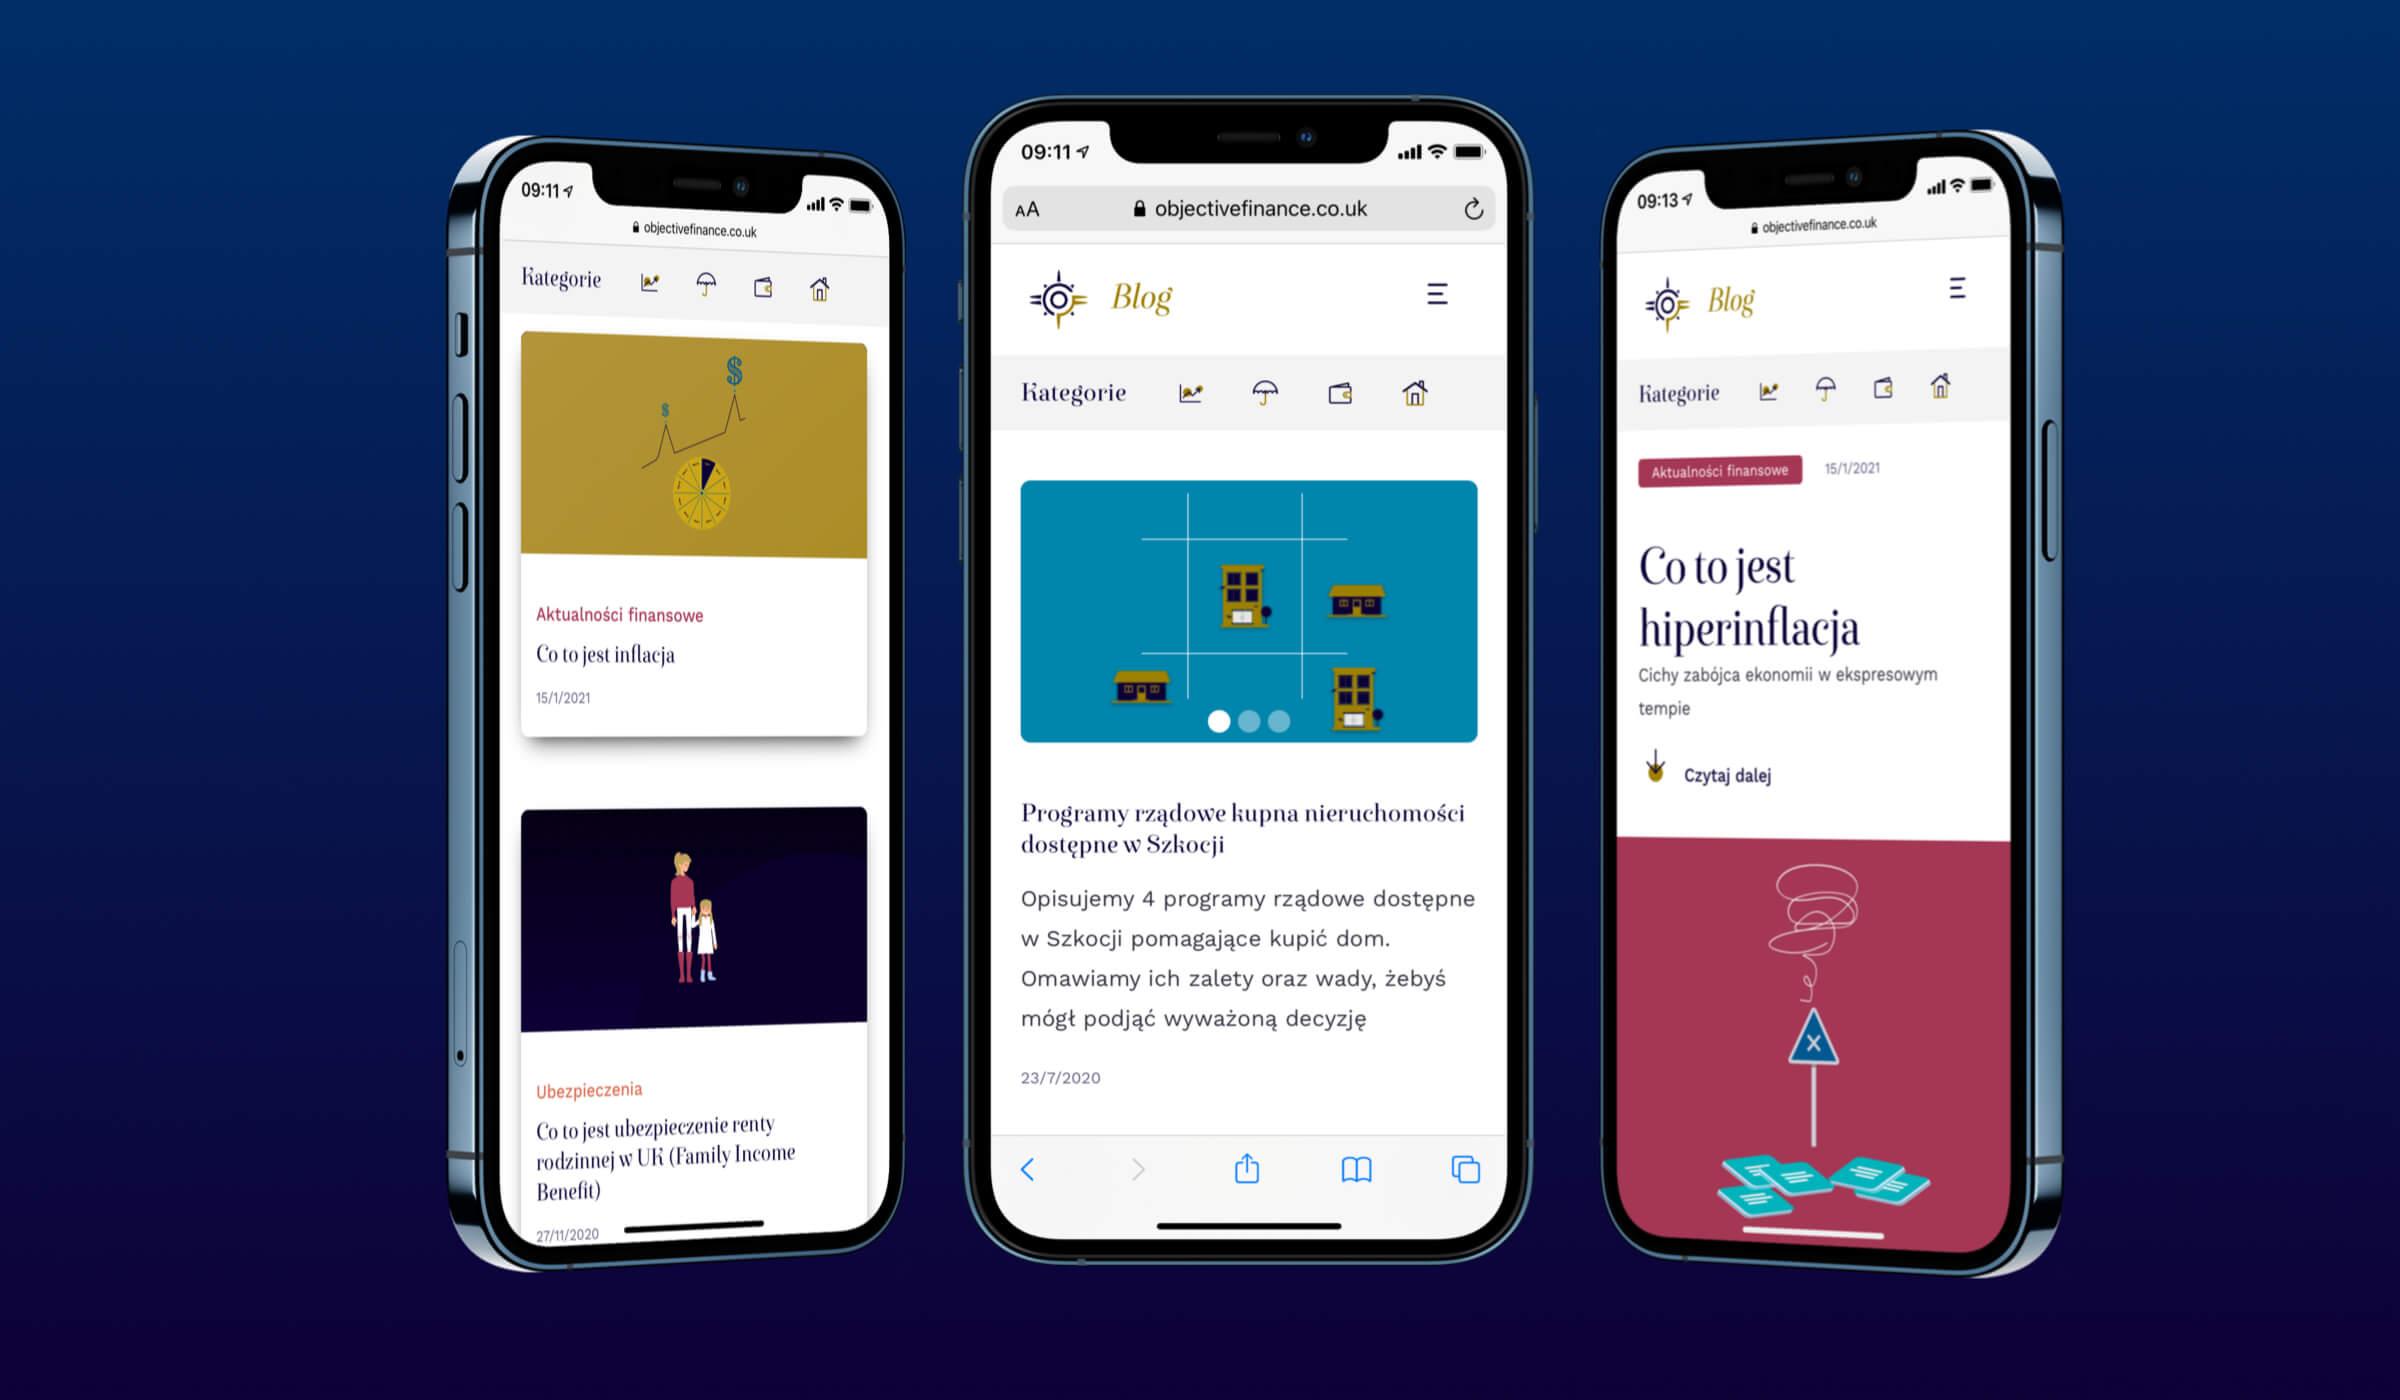 Objective Finance strona mobilna 3 widoki na iPhone